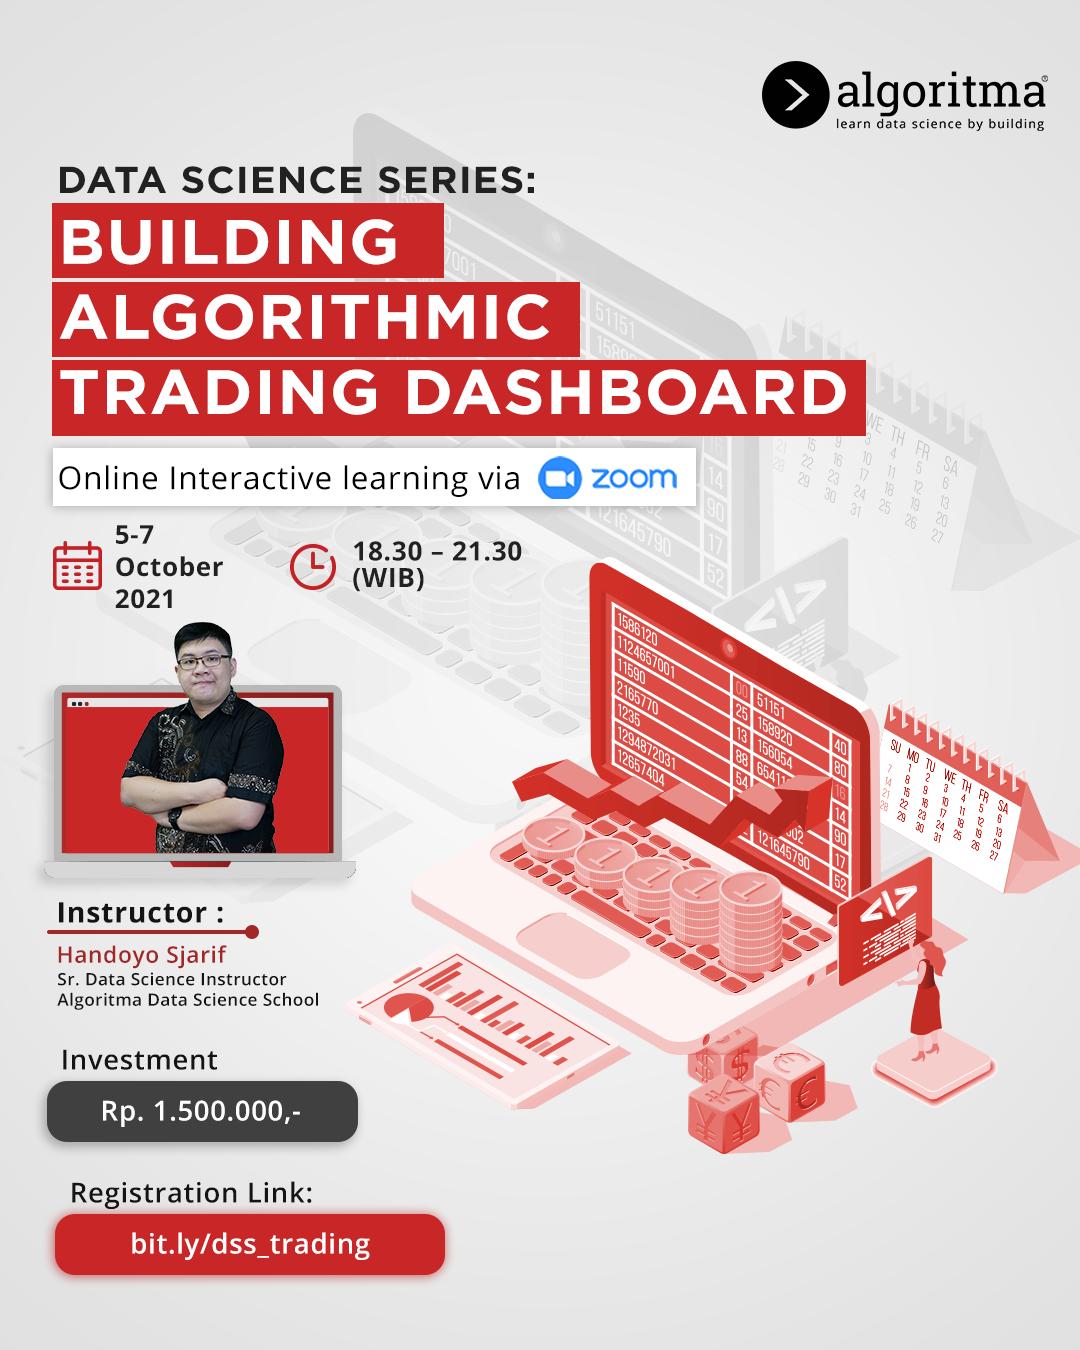 Building Algorithmic Trading Dashboard